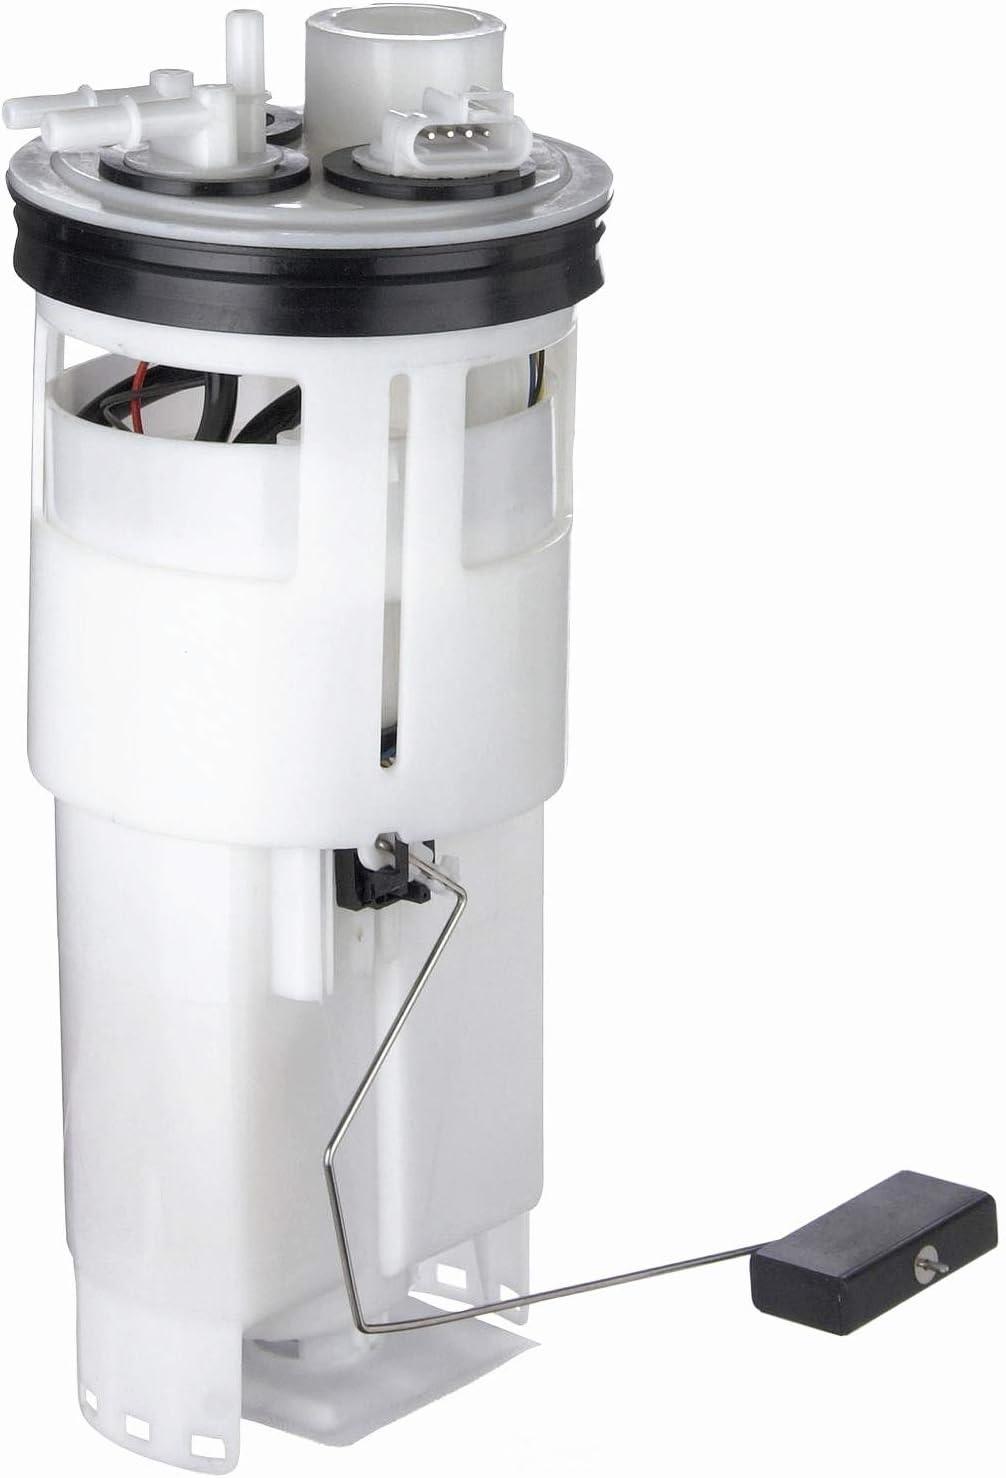 Maxfavor Fuel Pump Assembly with Sender for Dodge Ram 1500 2009-2016 3.7L 5.7L E7257M P76745M